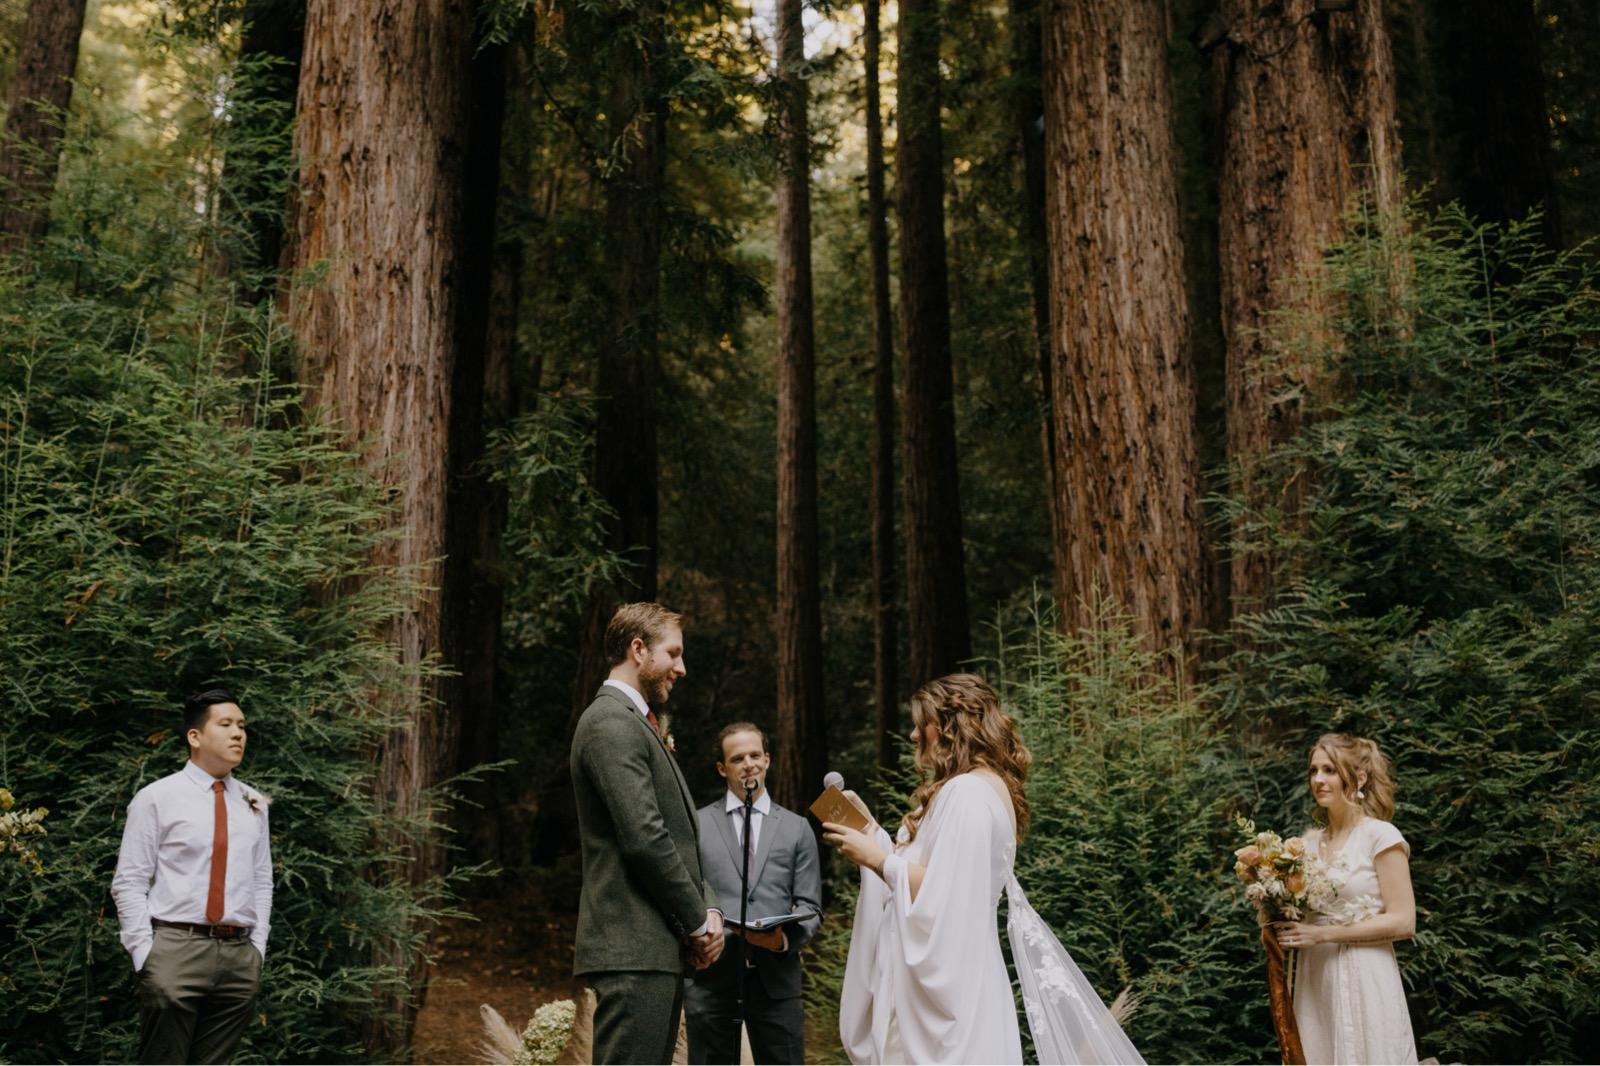 078_Emily & Jeff Wedding 0726_the-waterfall-lodge_forest_wedding_ben-lomond_intimate